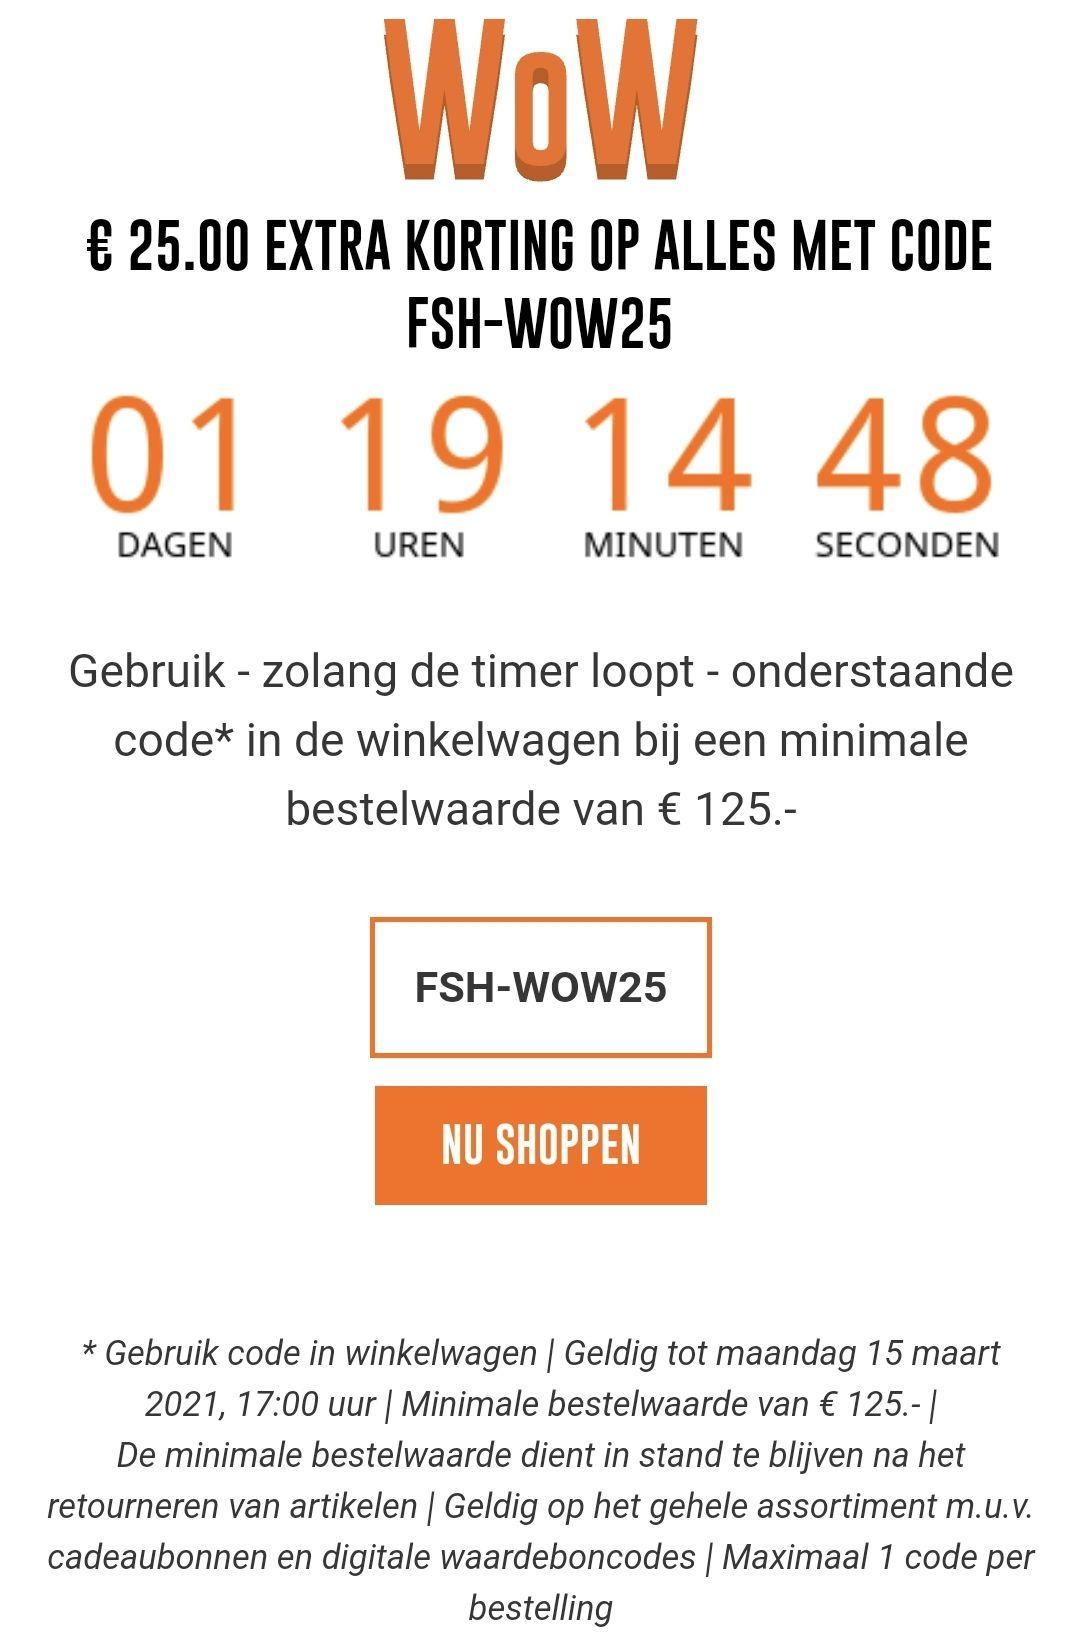 25 euro korting bij besteding van 125 euro @Futurumshop.nl